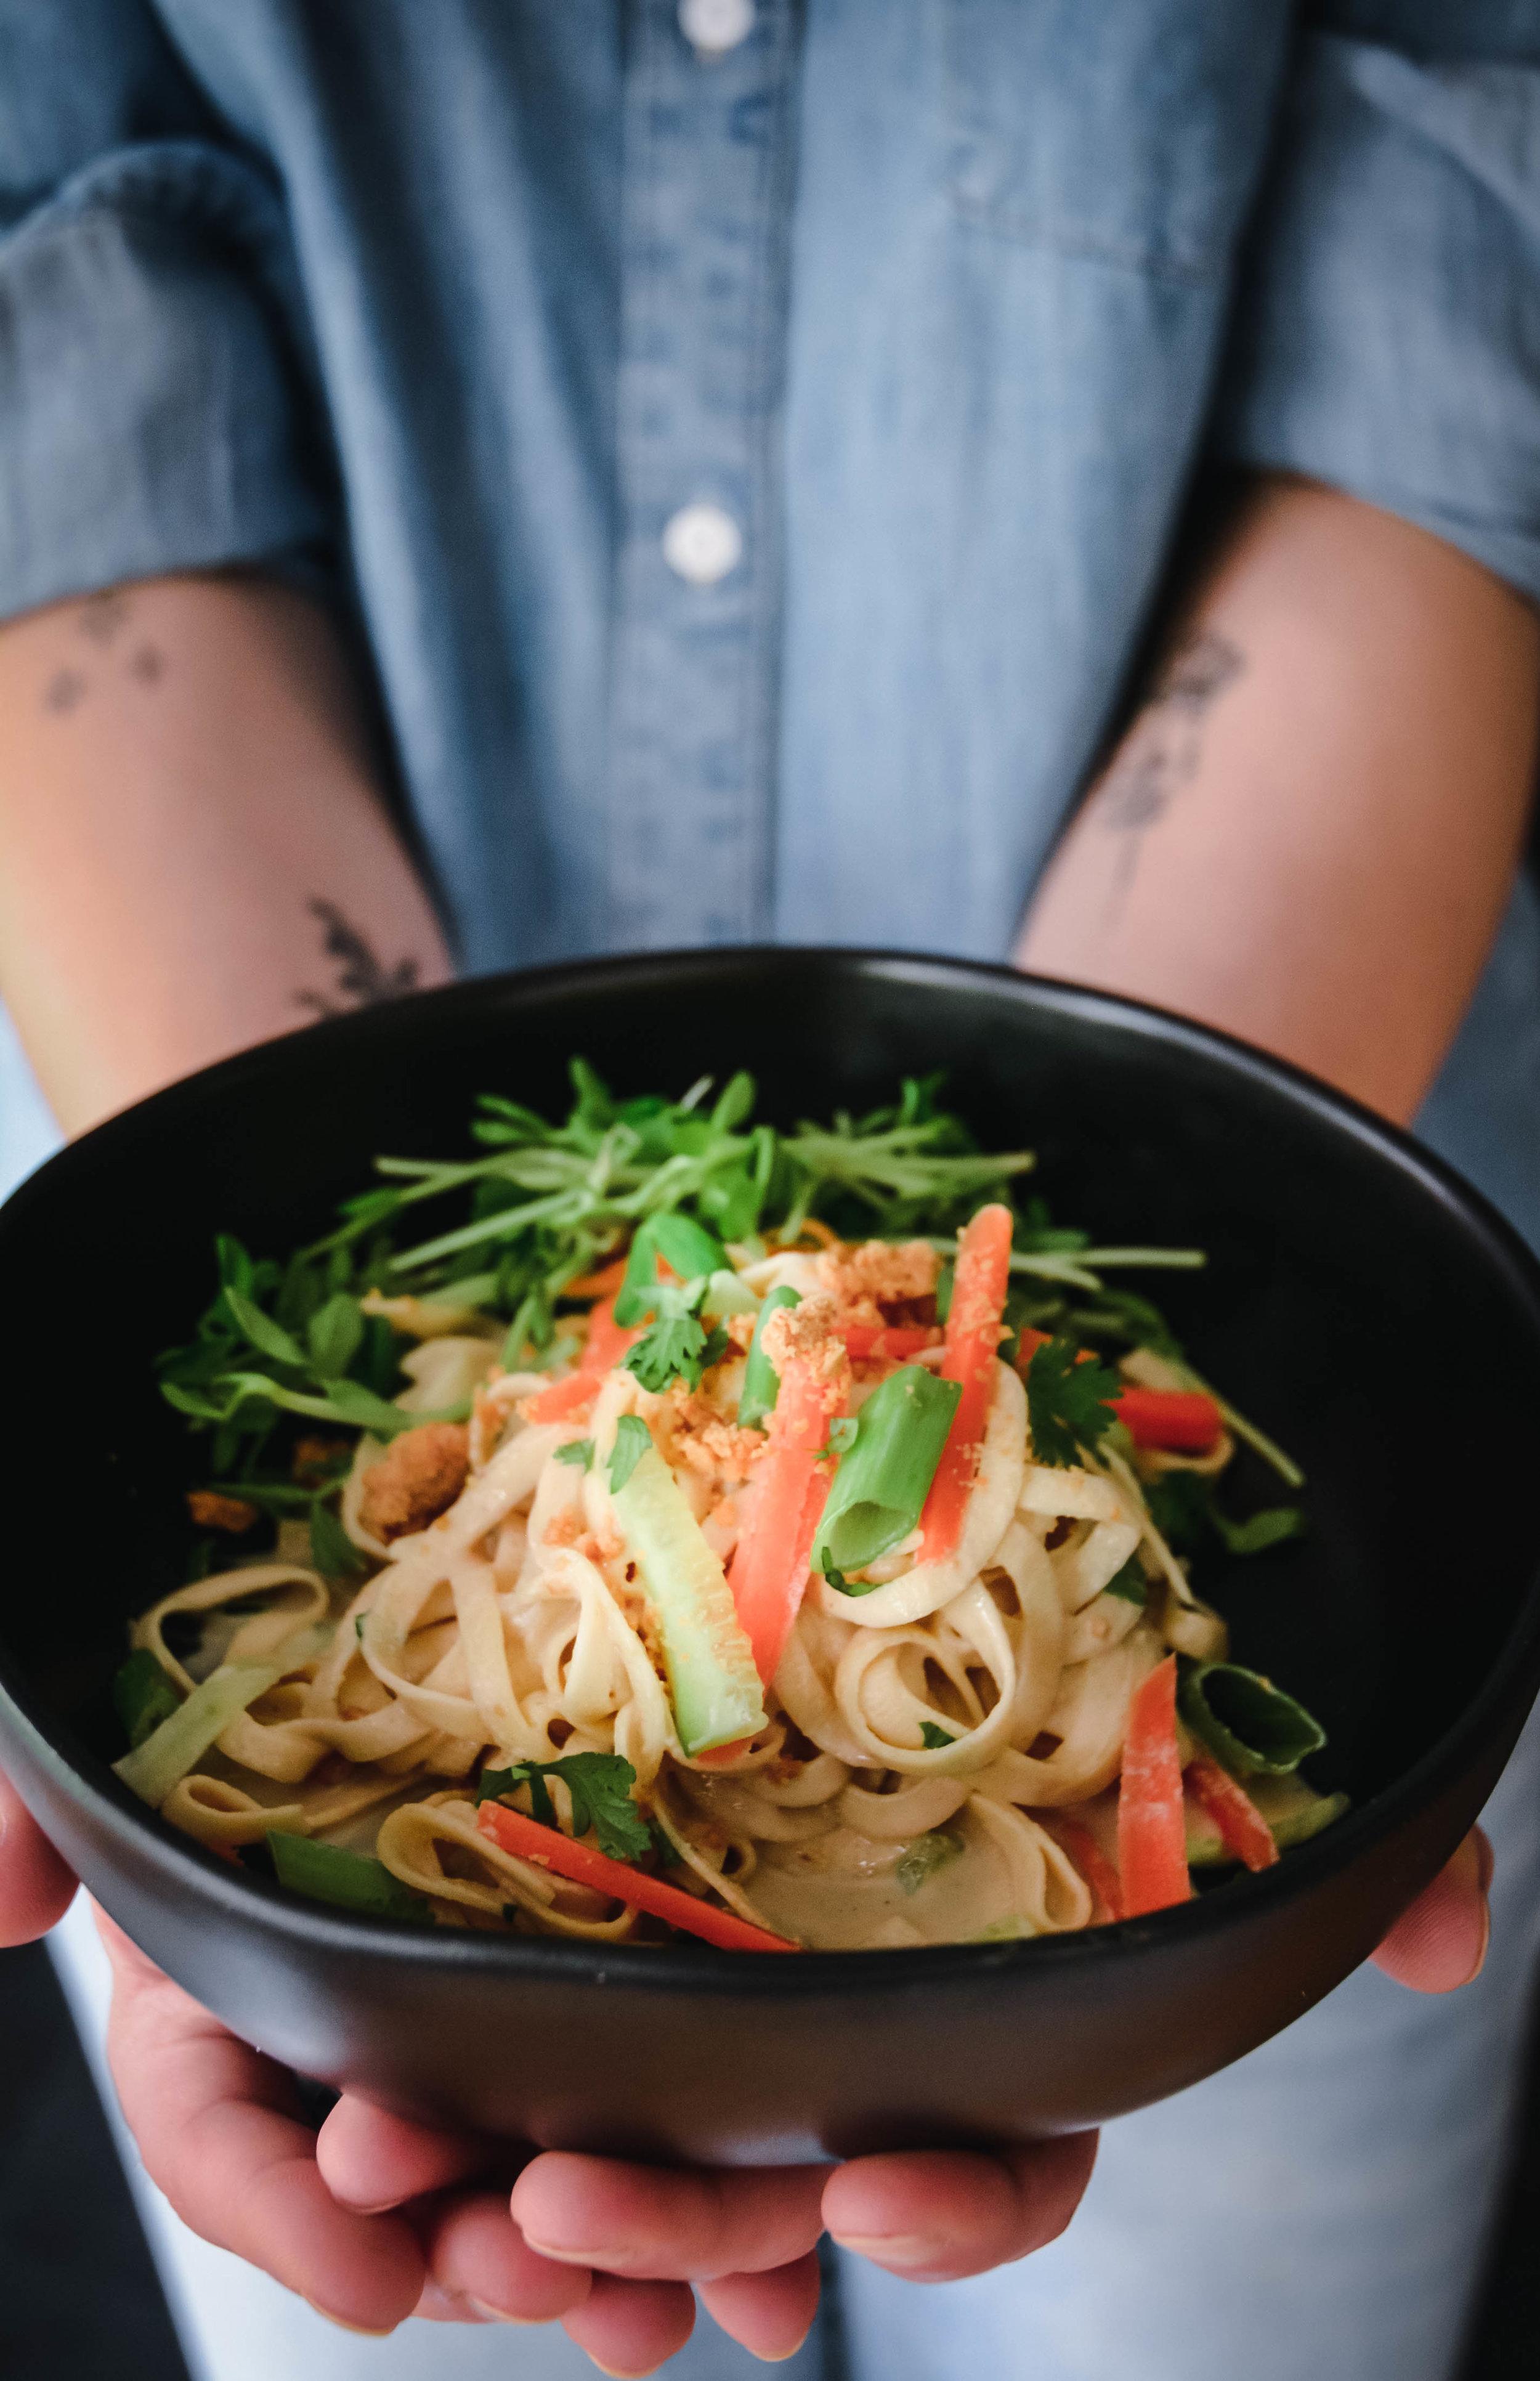 Hands holding bowl of rutabga noodles